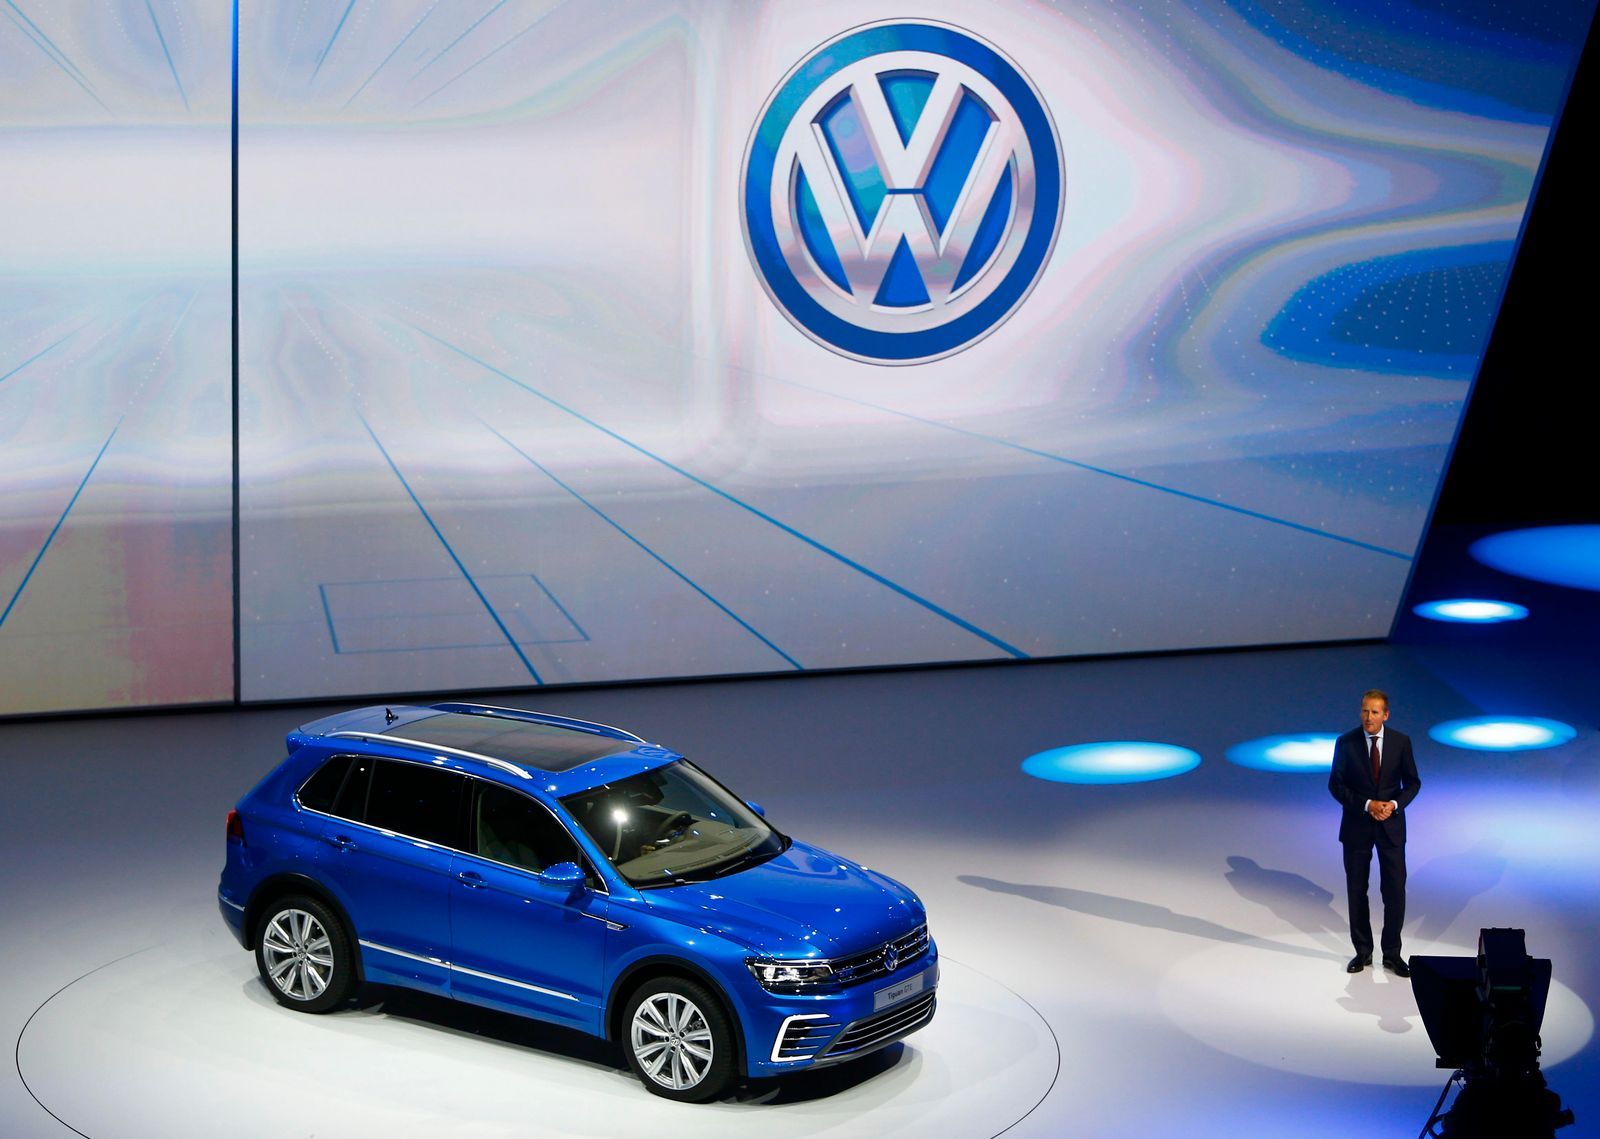 2015 / IAA / VW Tiguan GTE / Herbert Diess